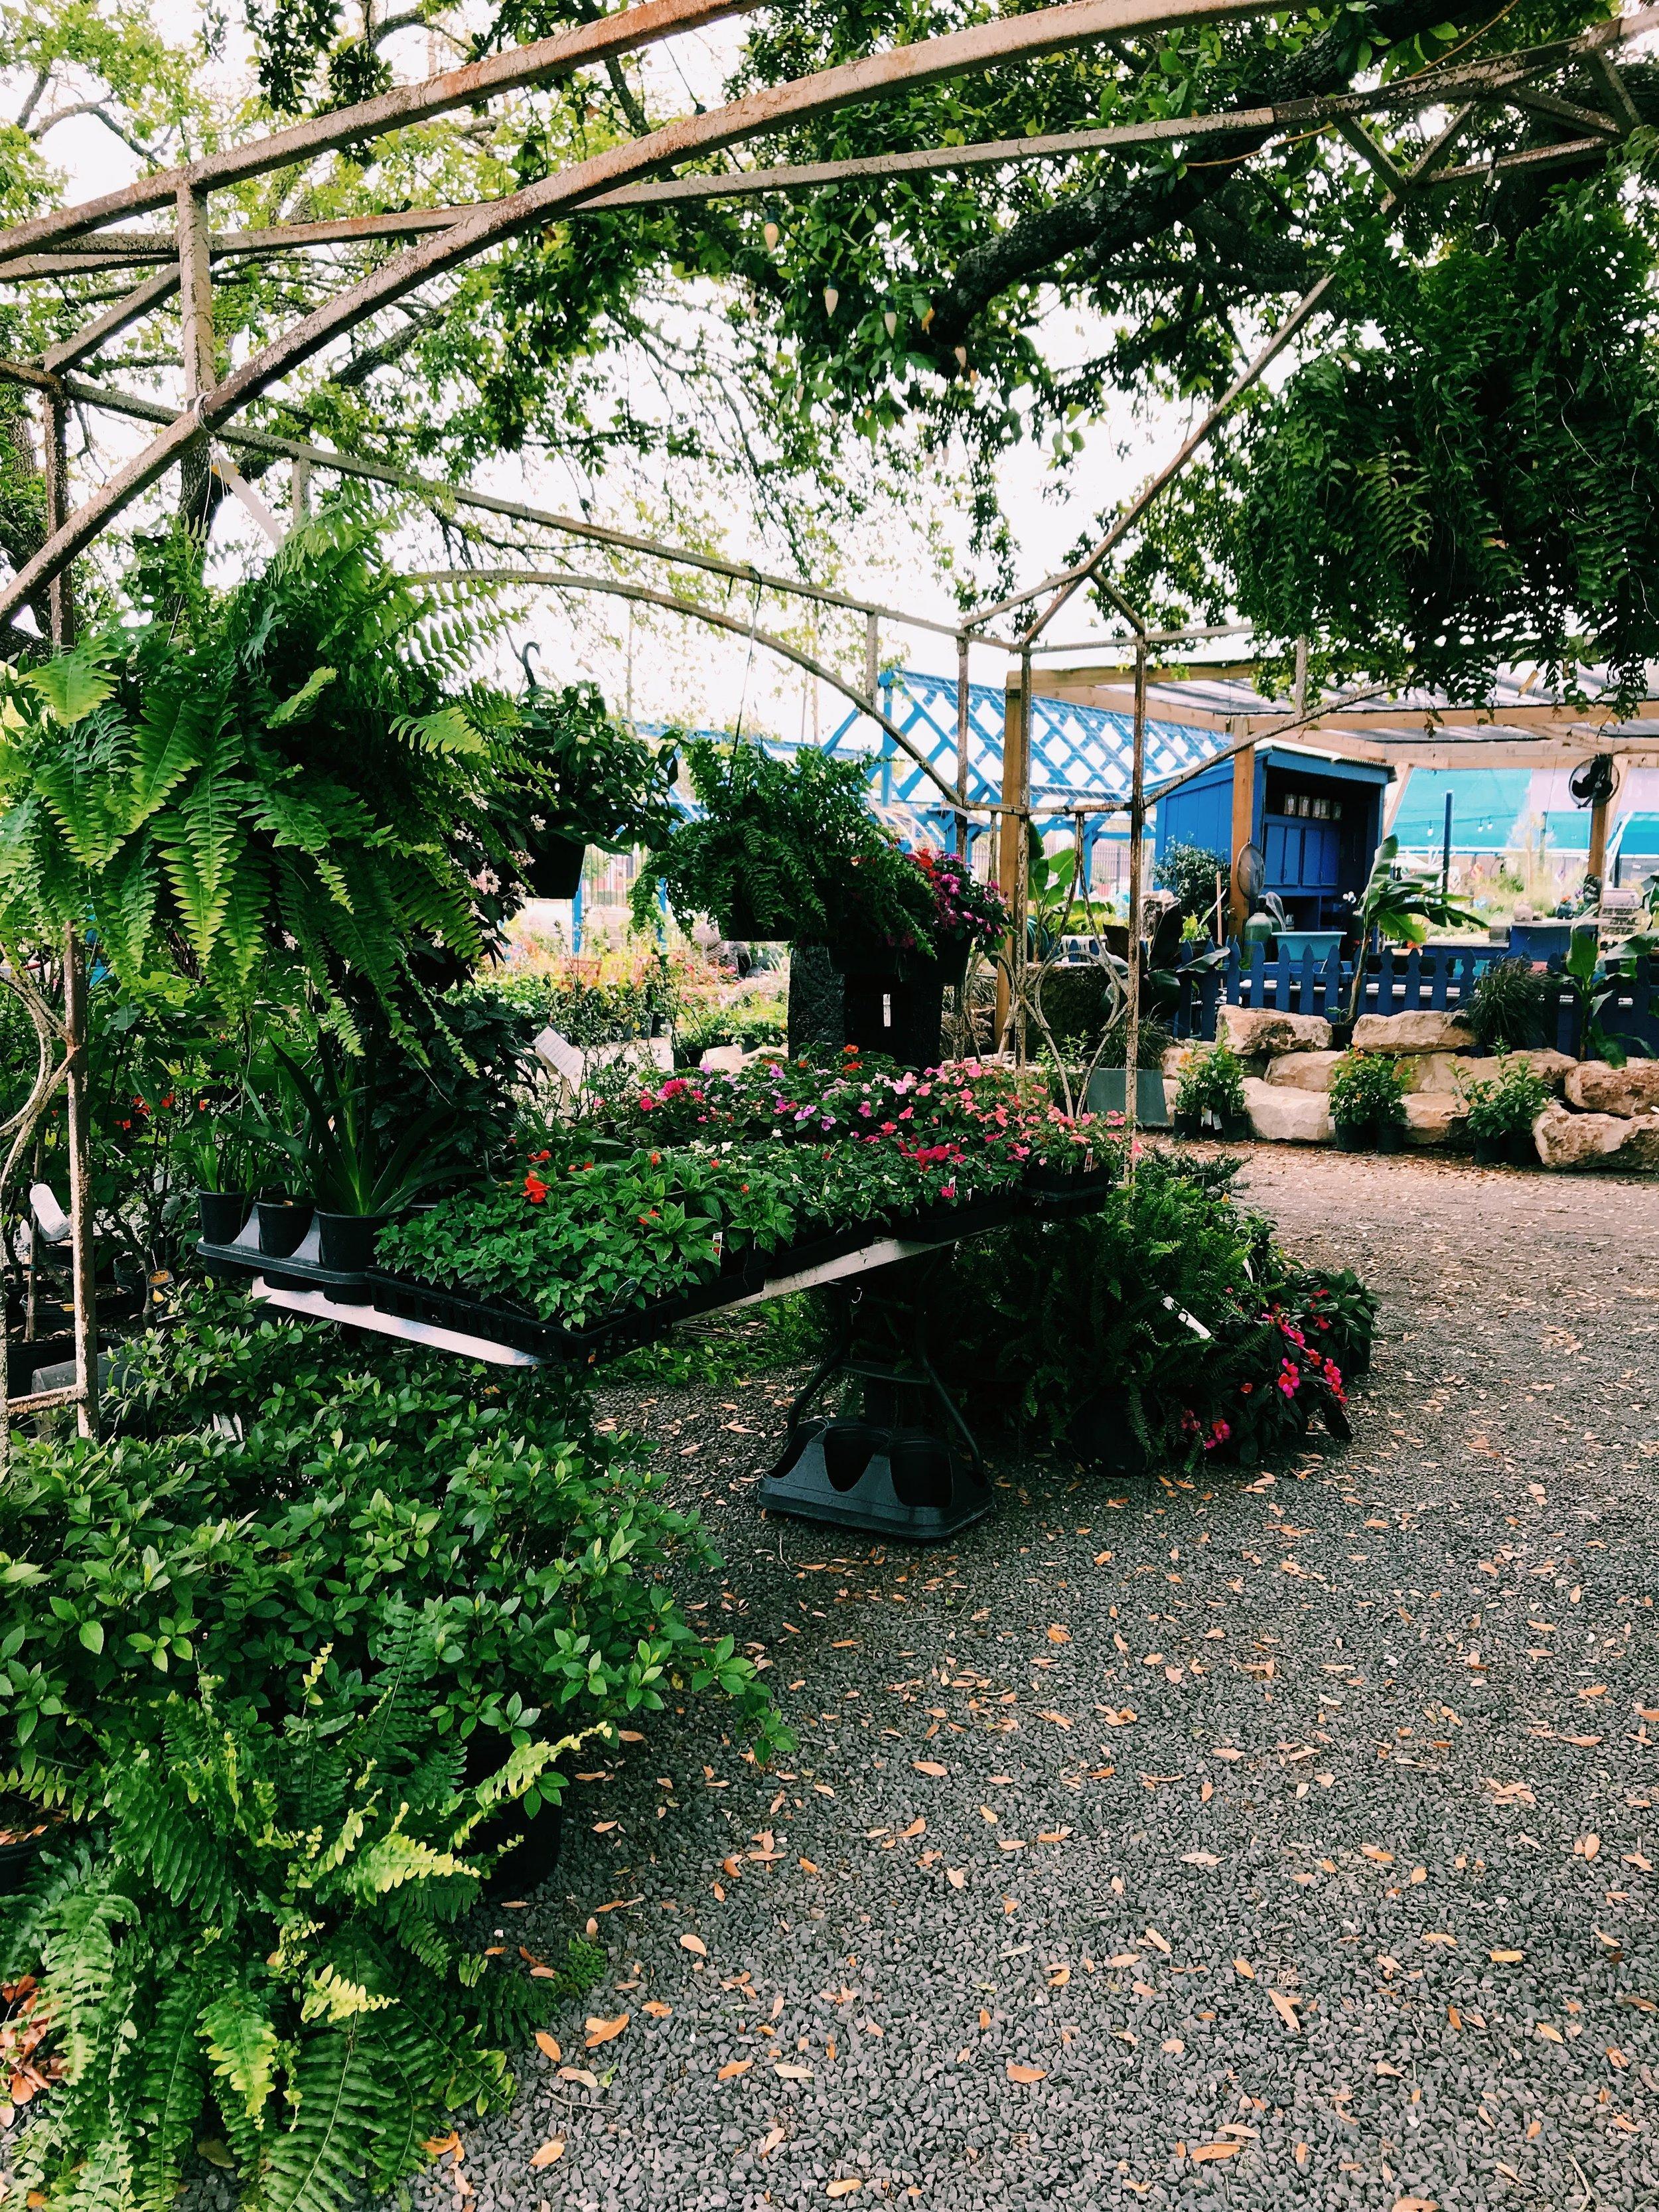 Three Heel Clicks - Houston Hotspots - Nelson Water Gardens (31).jpg